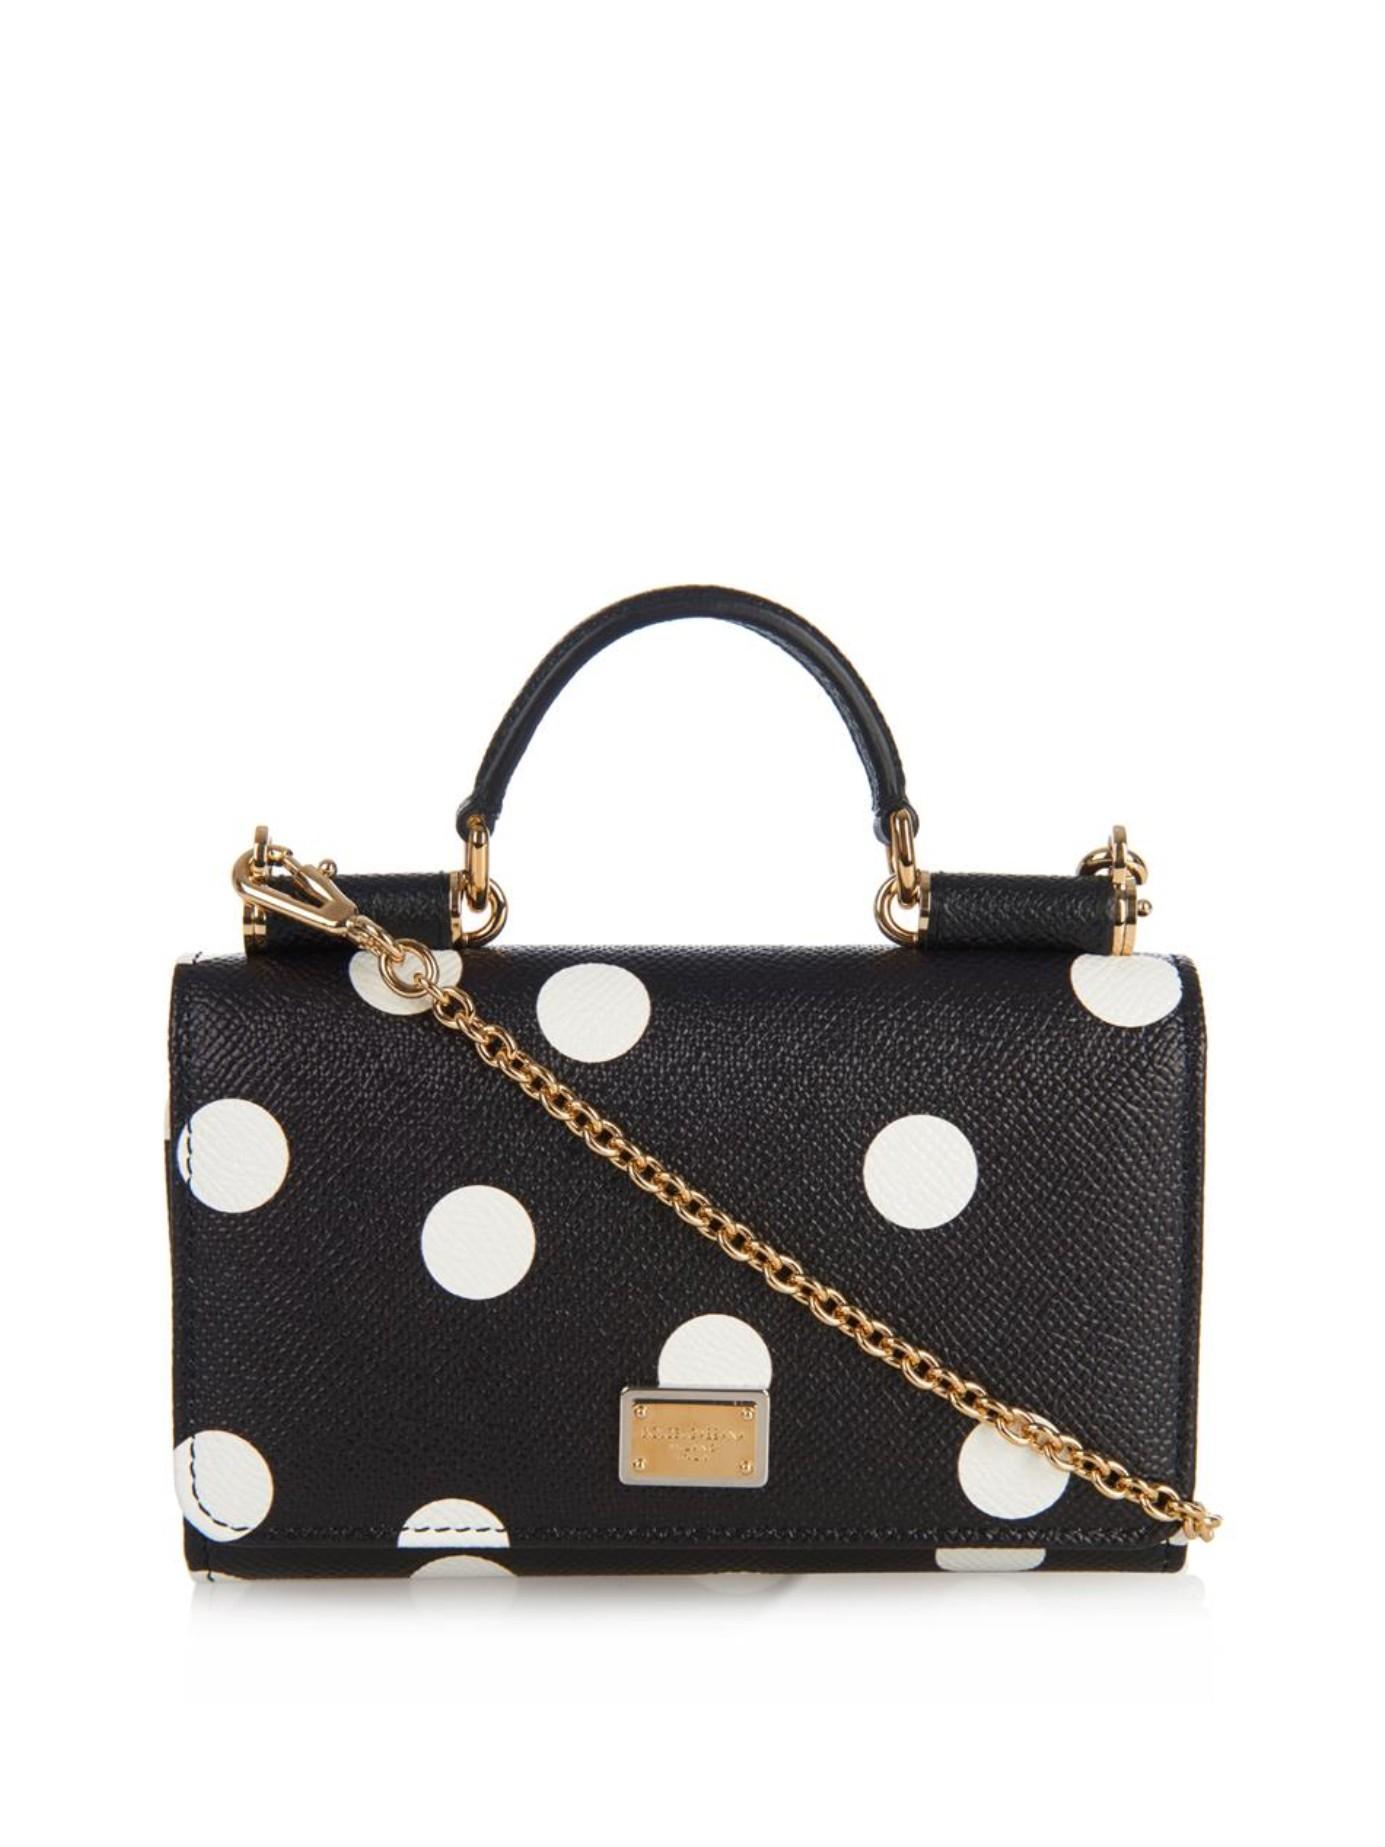 a27a8dd3cb08 Lyst - Dolce   Gabbana Disco Polka-Dot Leather Cross-Body Bag in Black